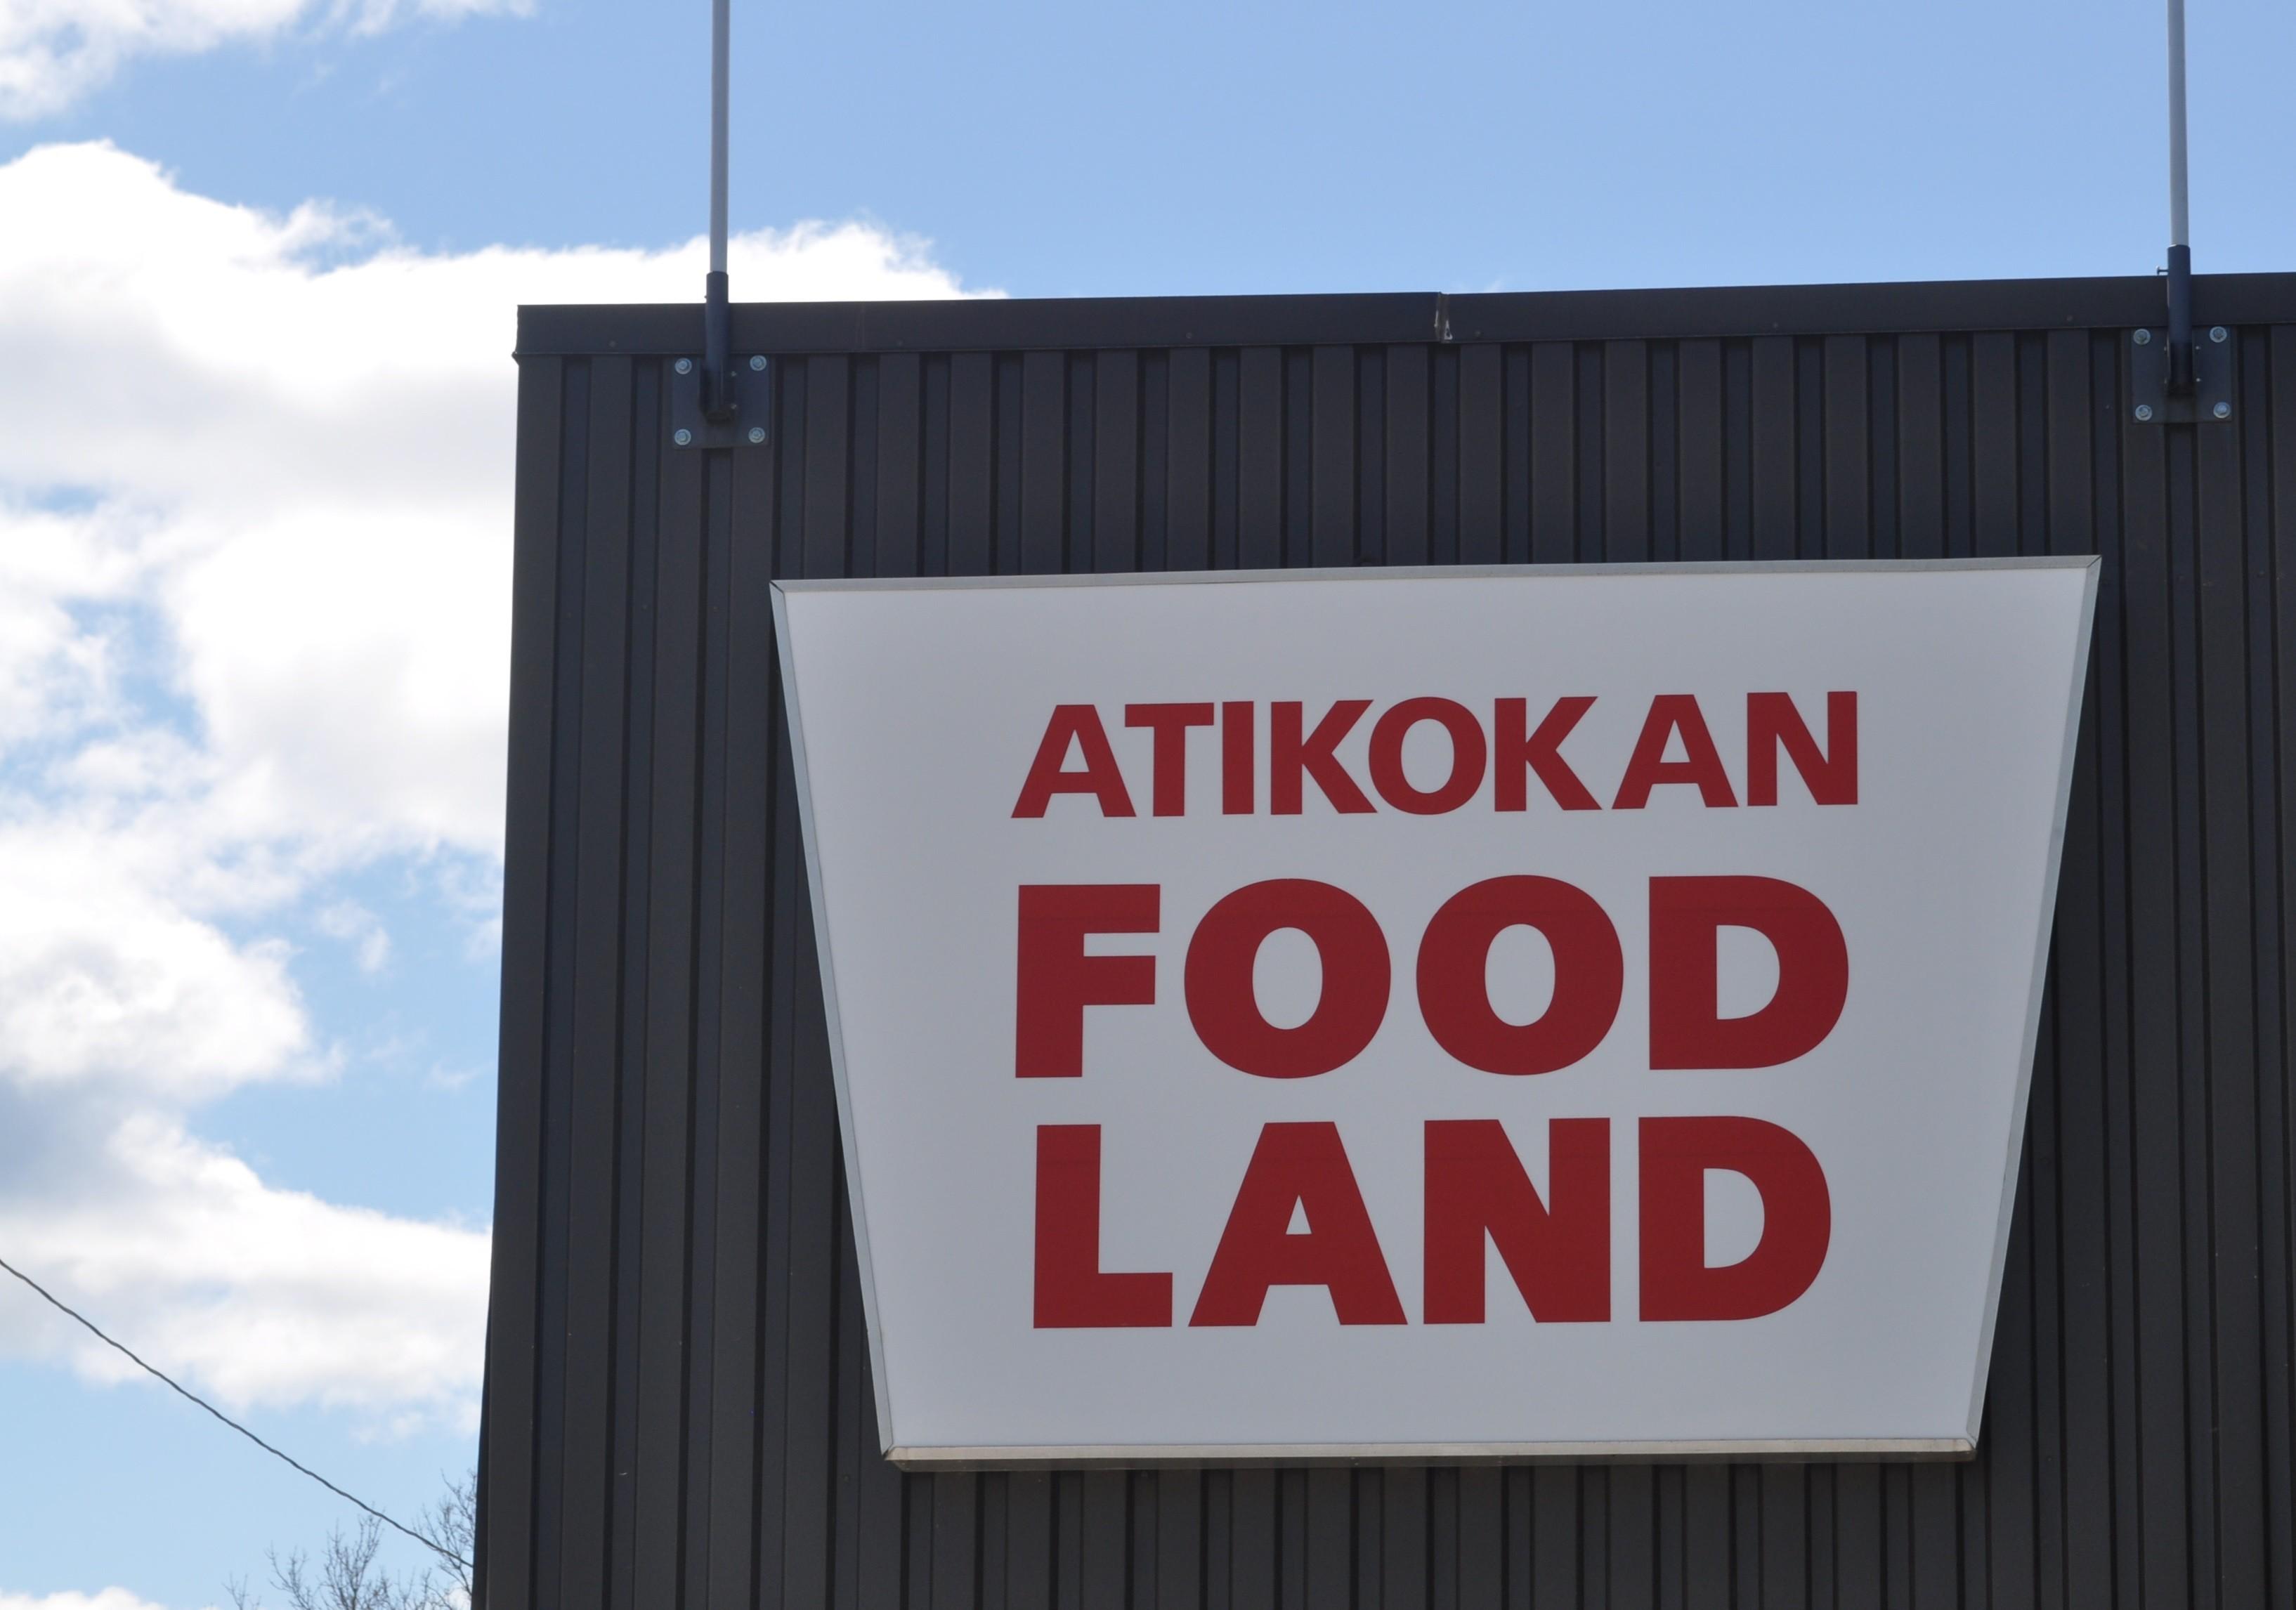 Atikokan Foodland